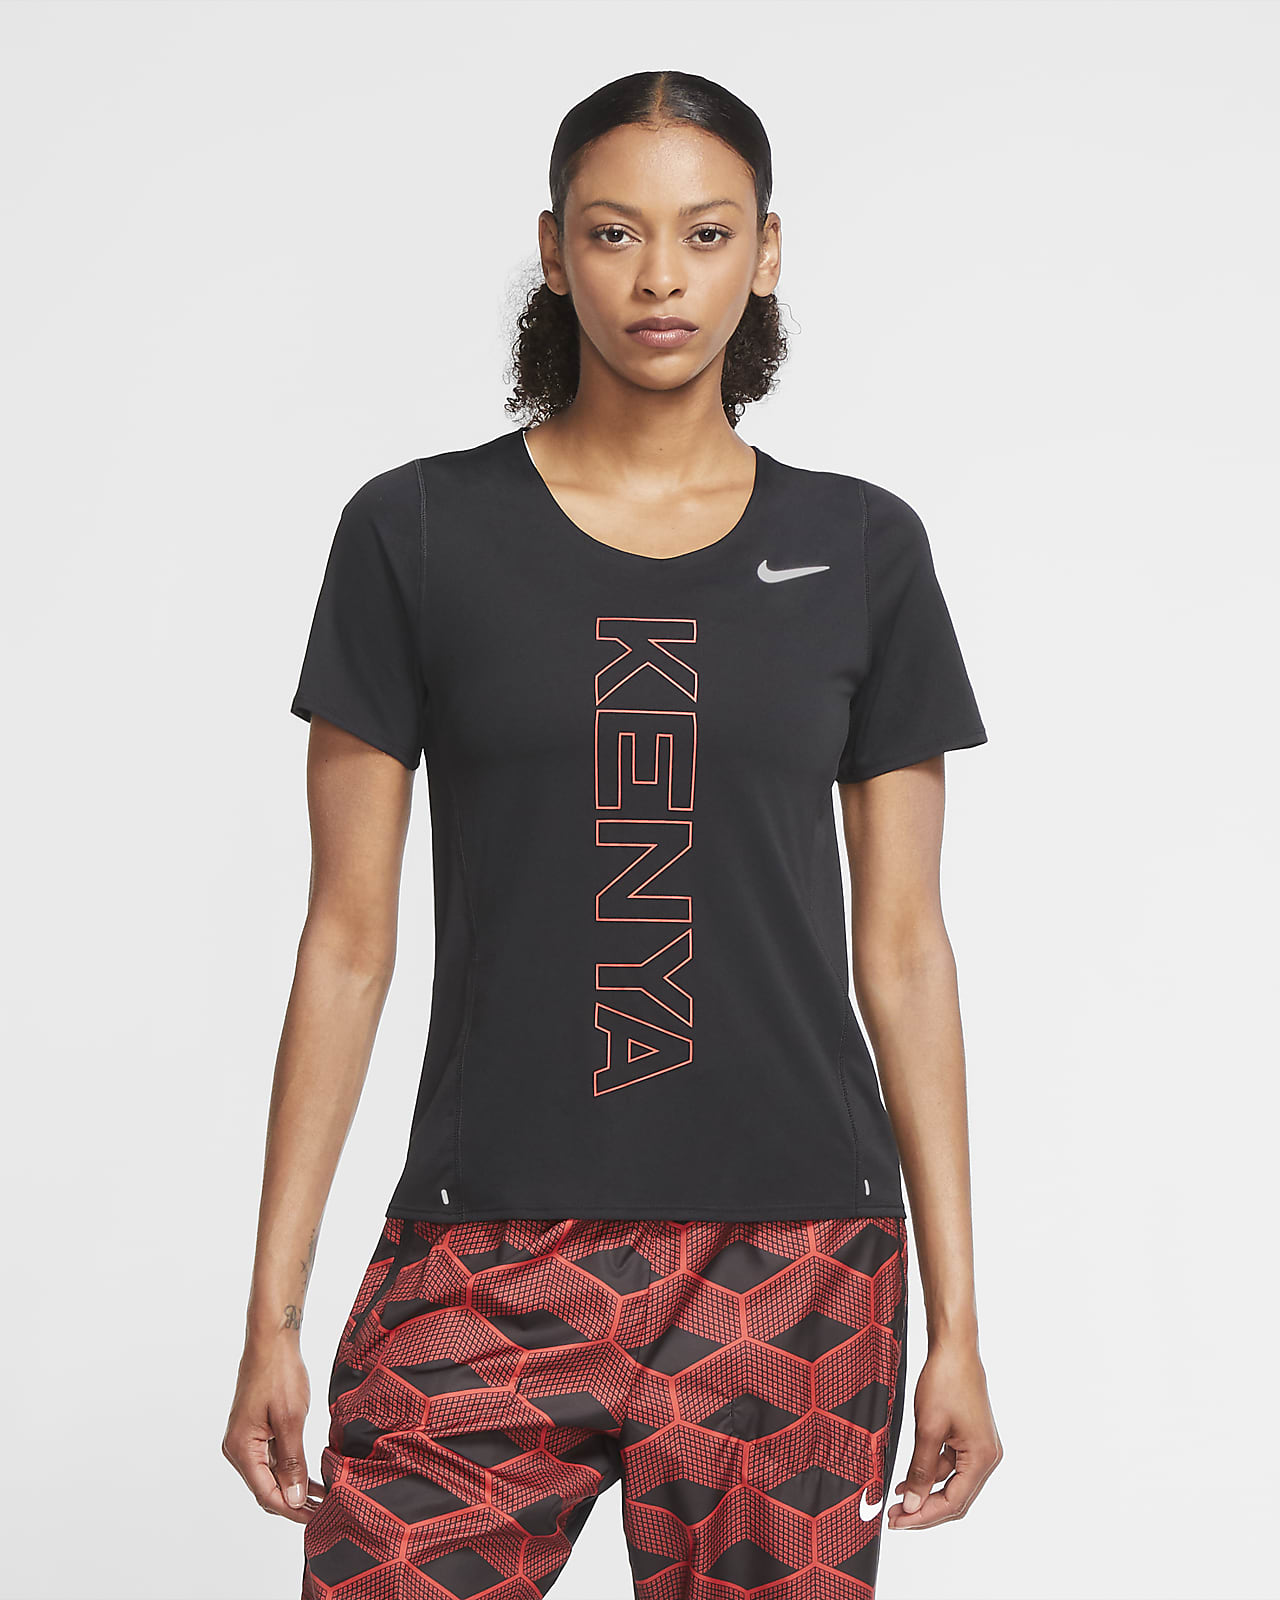 Nike Team Kenya City Sleek Women's Running Top